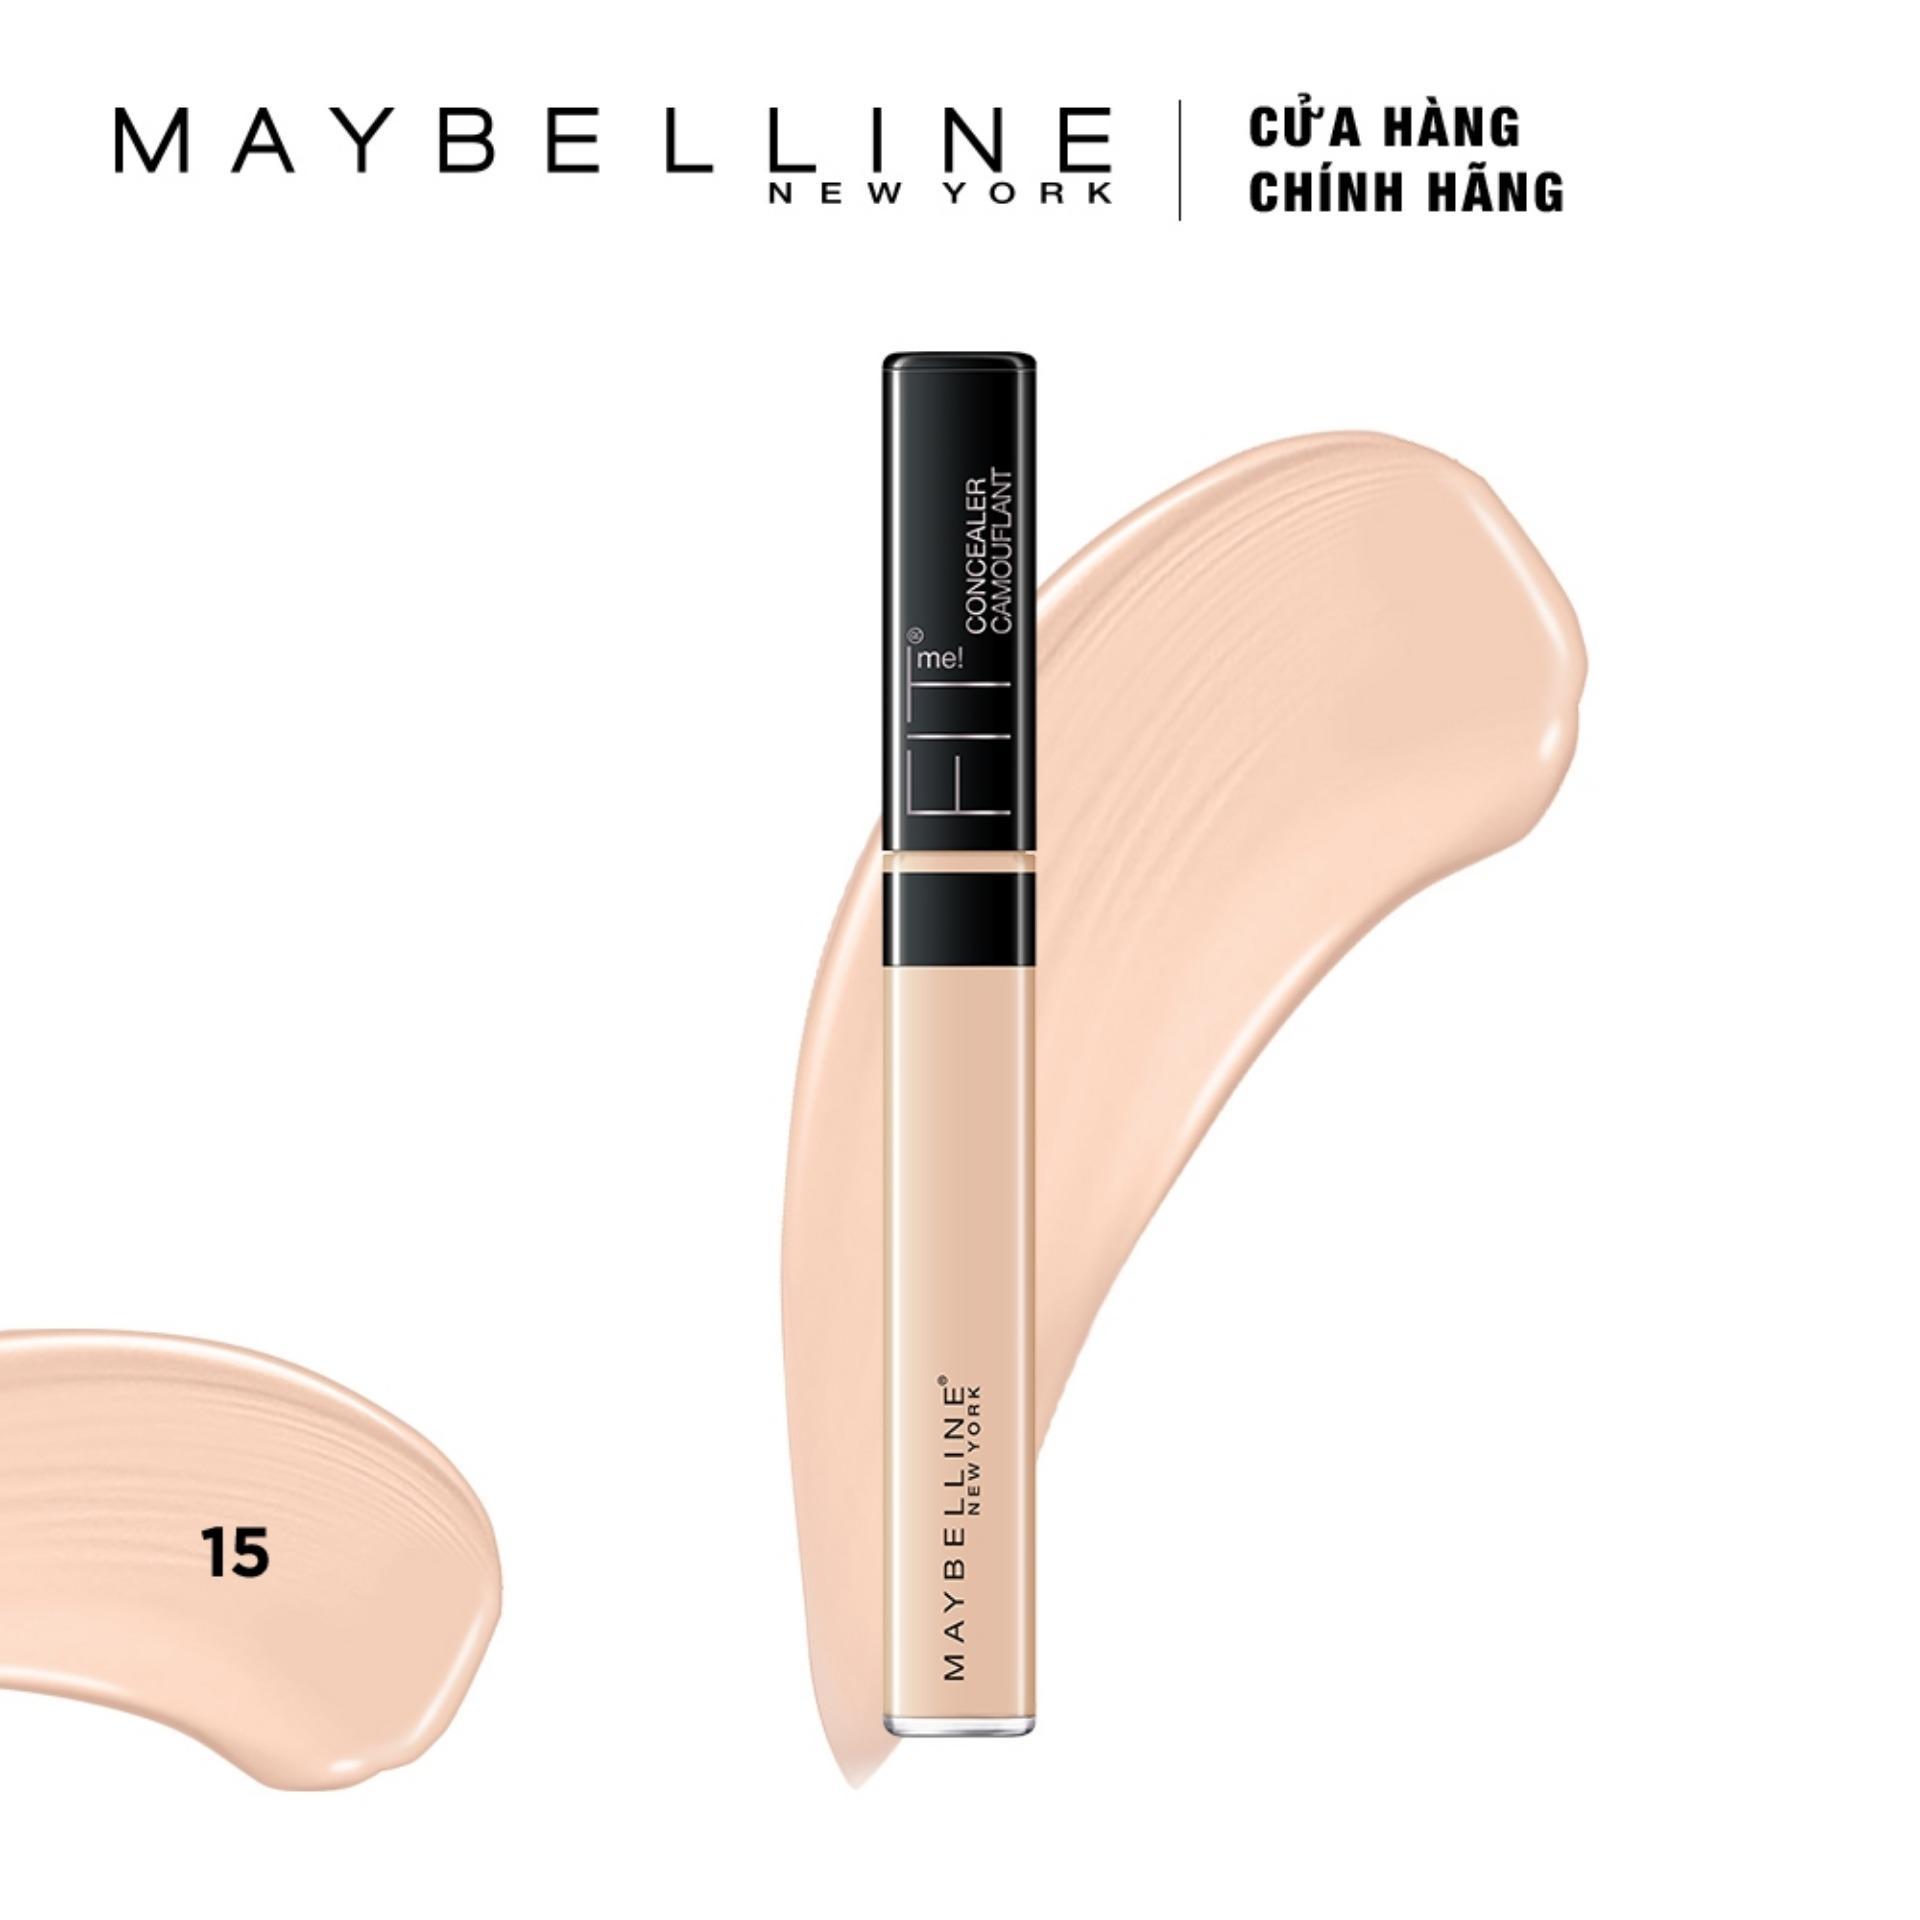 Kem che khuyết điểm đa năng Maybelline New York New York Fit Me Concealer 6.8ml